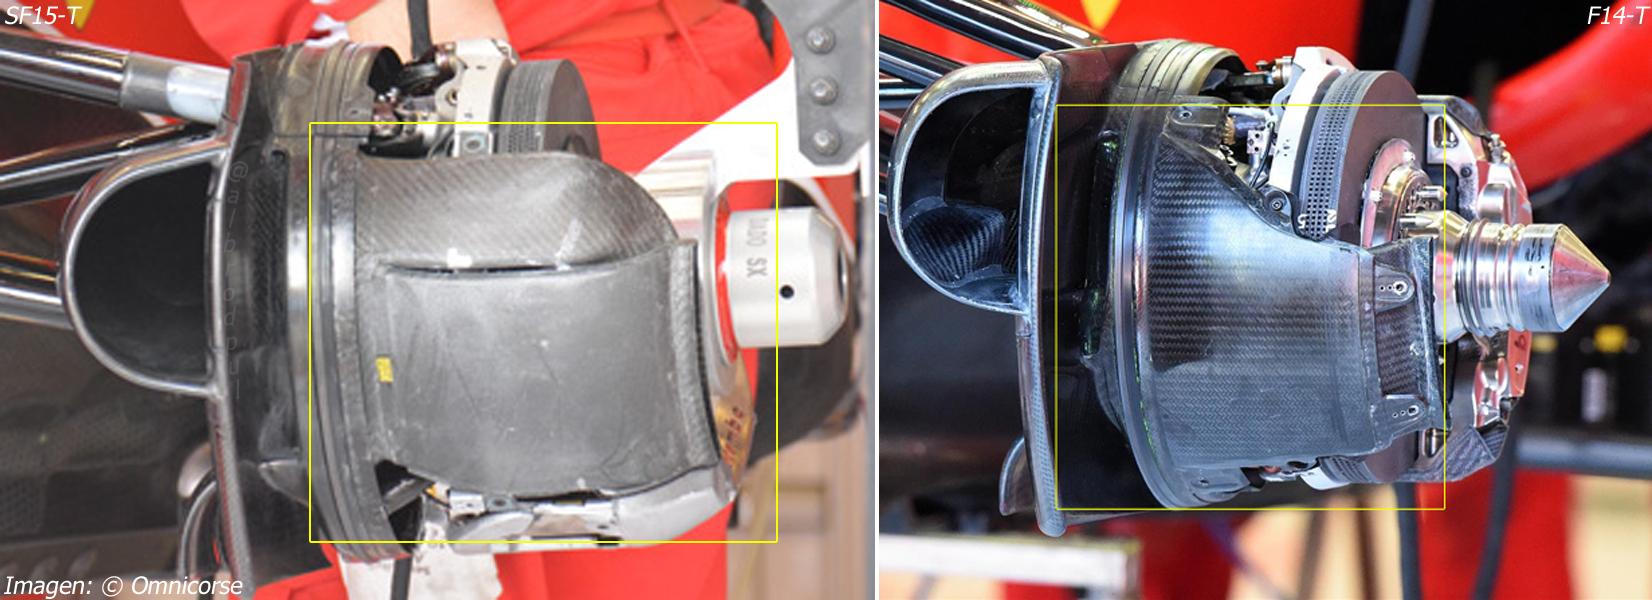 sf15-brakes